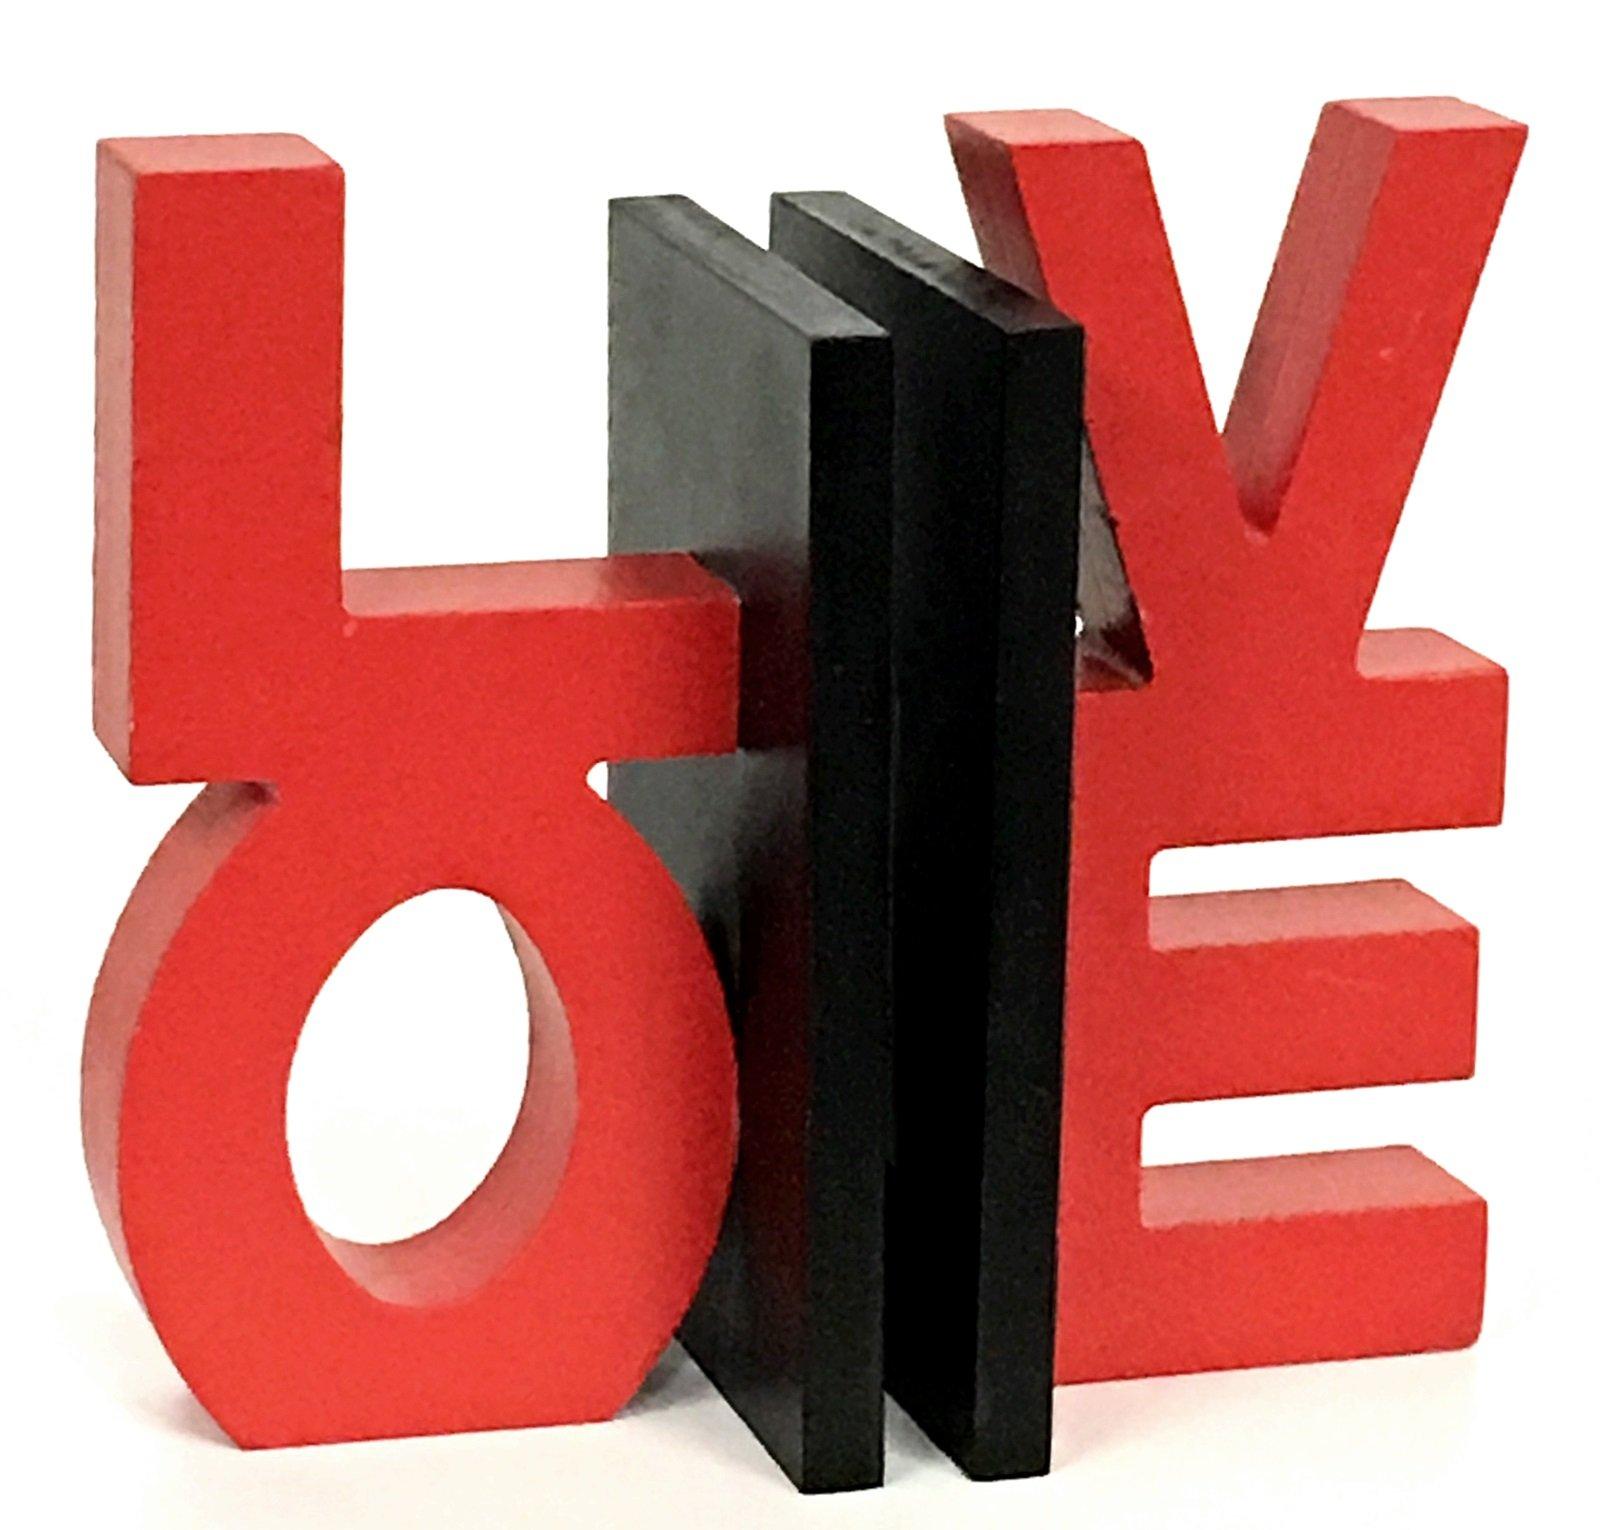 Bellaa 22762 Love Word Bookends Inspirational Bookshelf Decor 7.5'' inches Tall